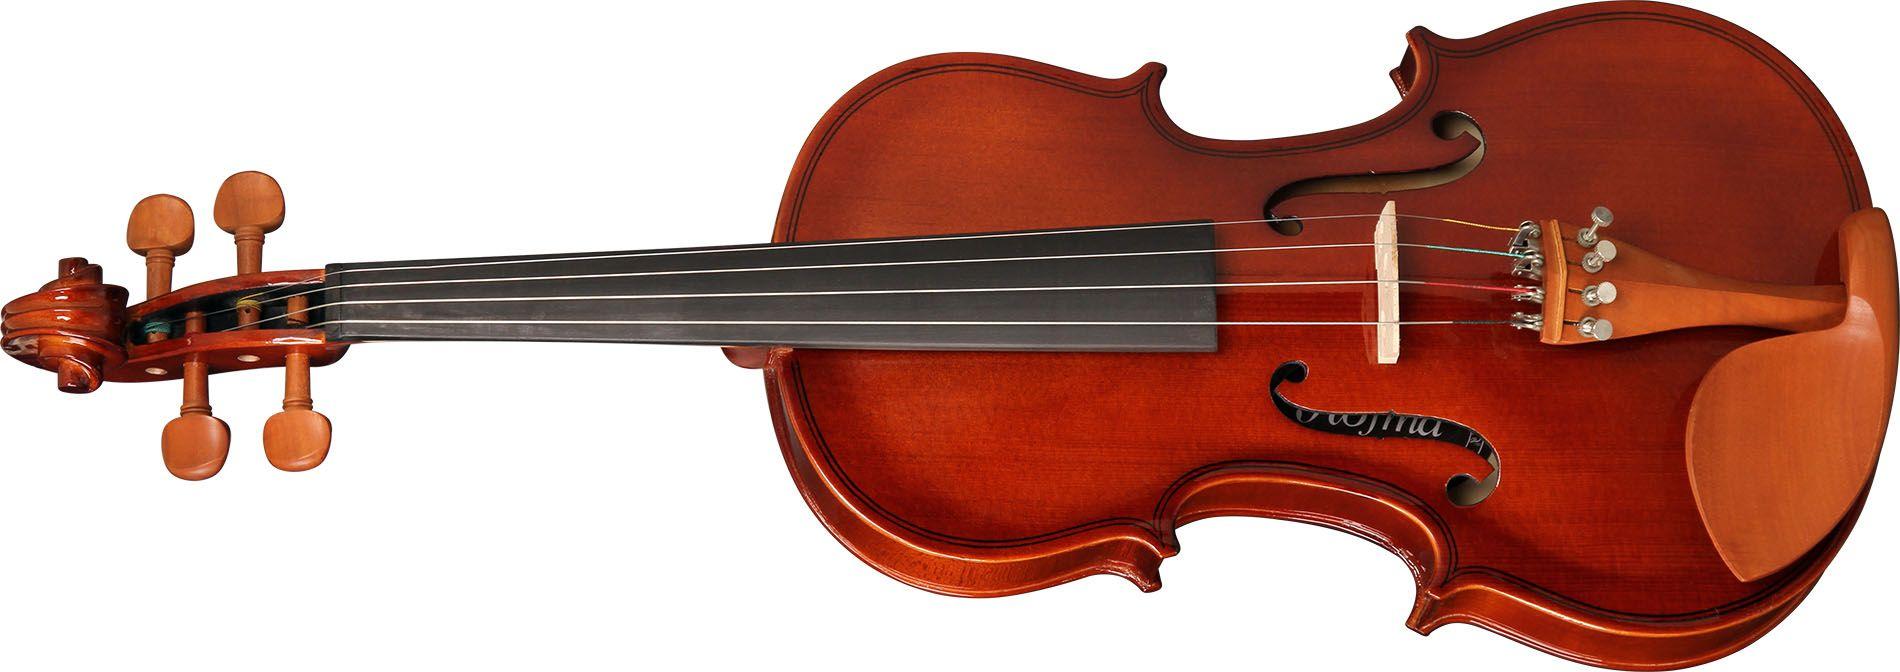 Violino Hofma Hve242 4/4 Estudante Completo